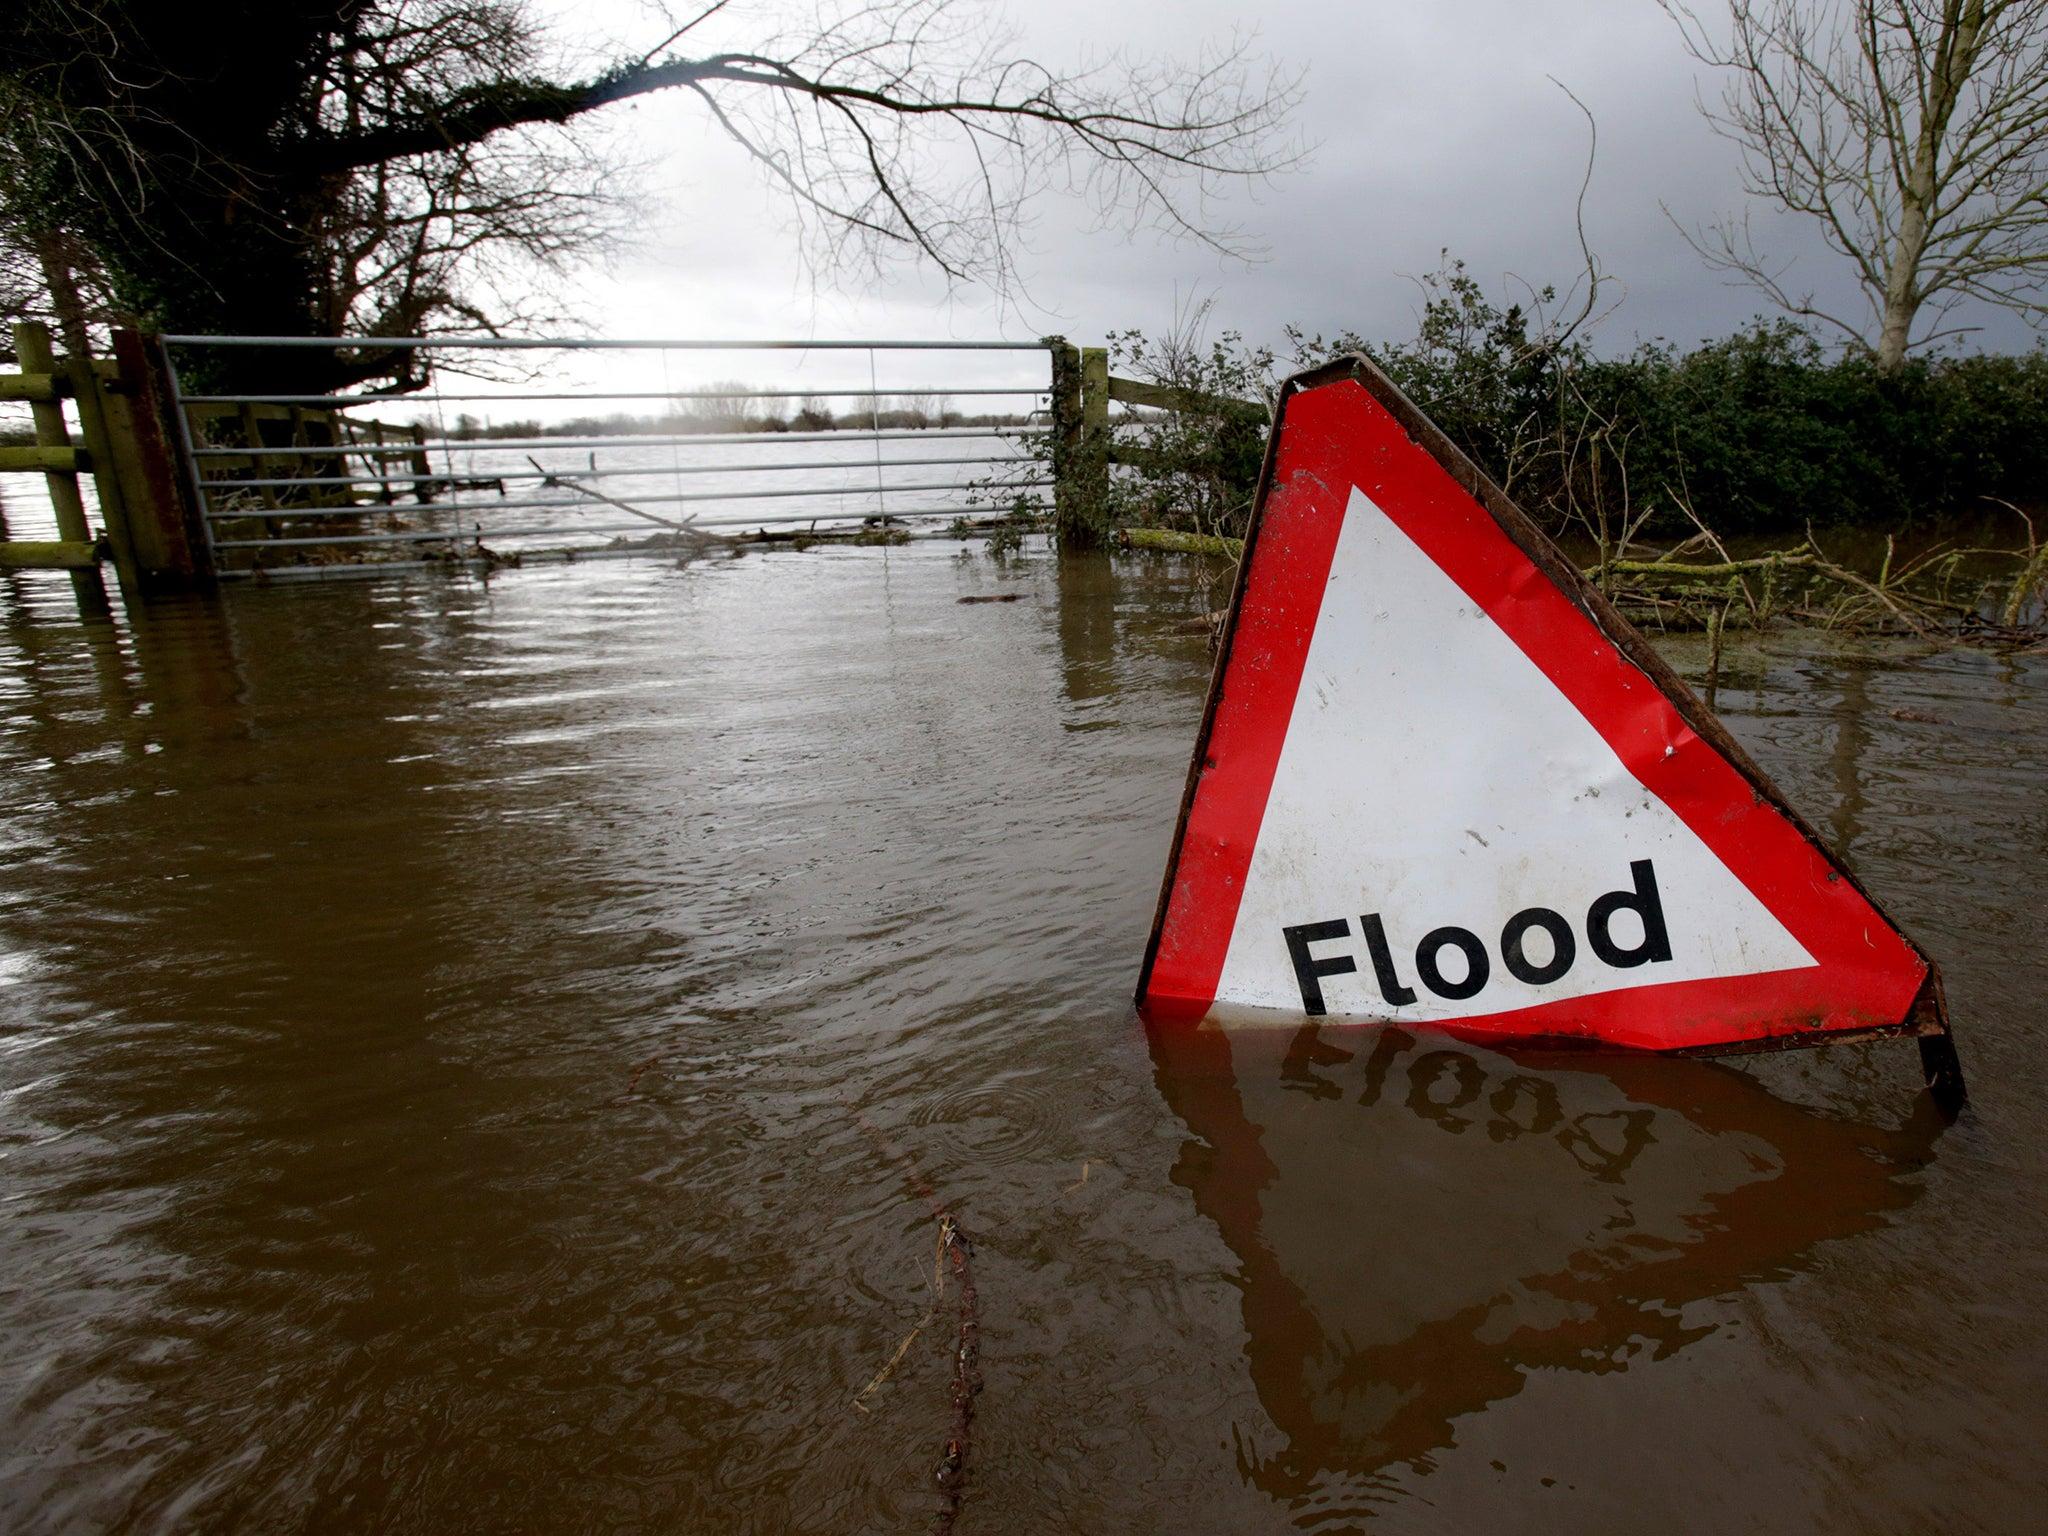 Global warming will unleash increasingly devastating ...